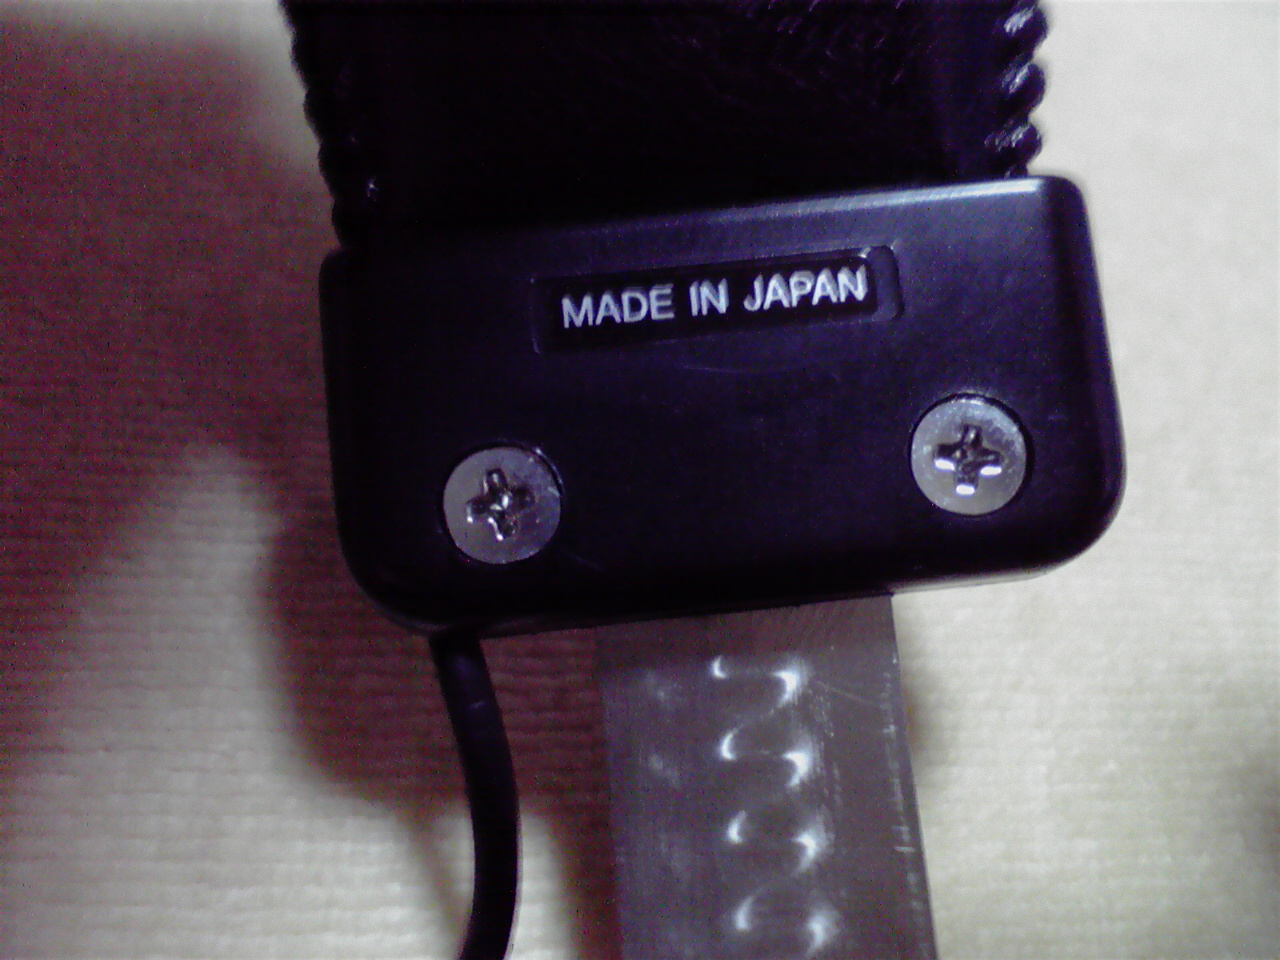 MDR-CD900ST 06